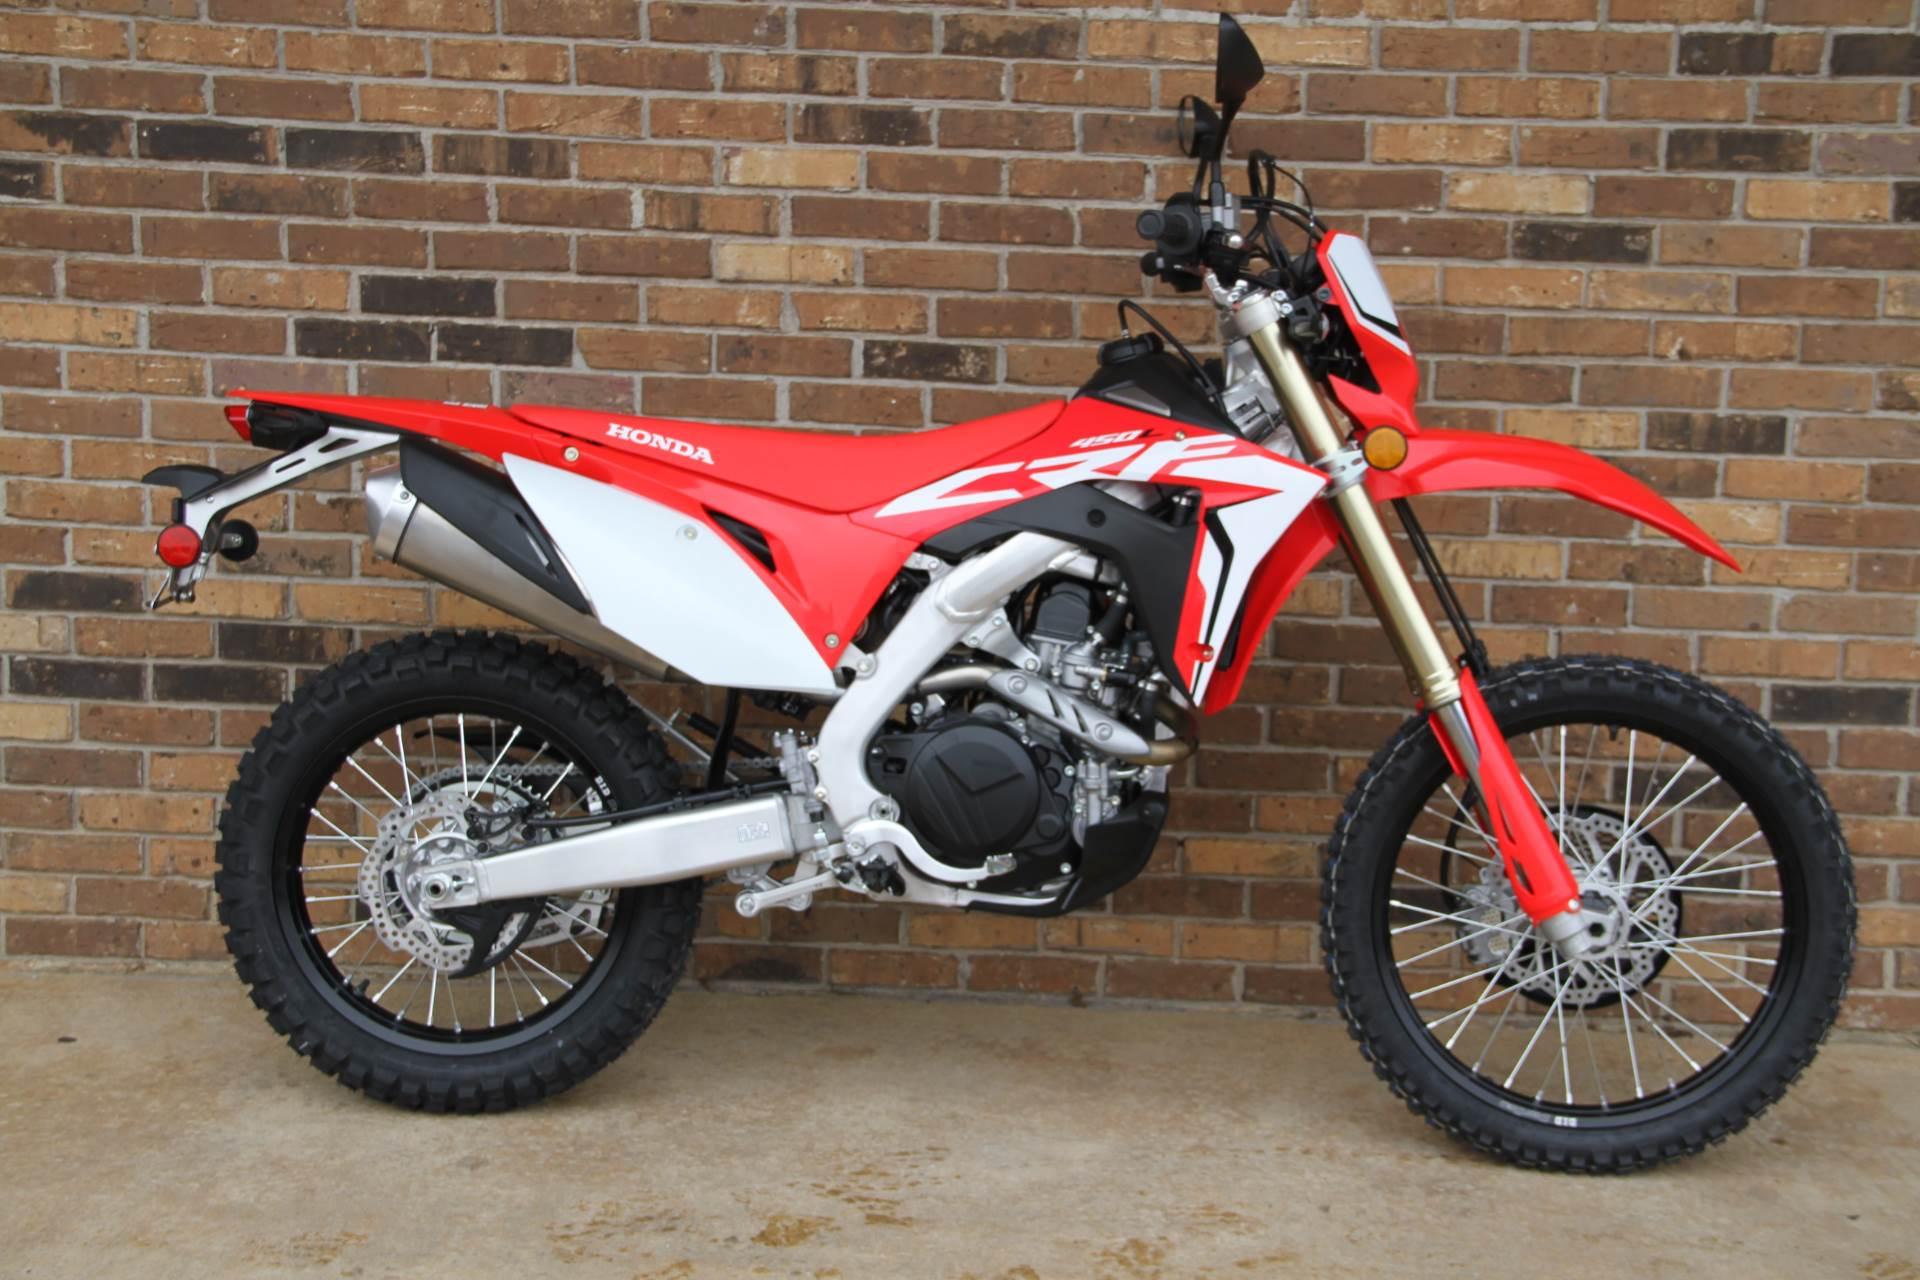 New 2019 Honda Crf450l Motorcycles In Hendersonville Nc Stock